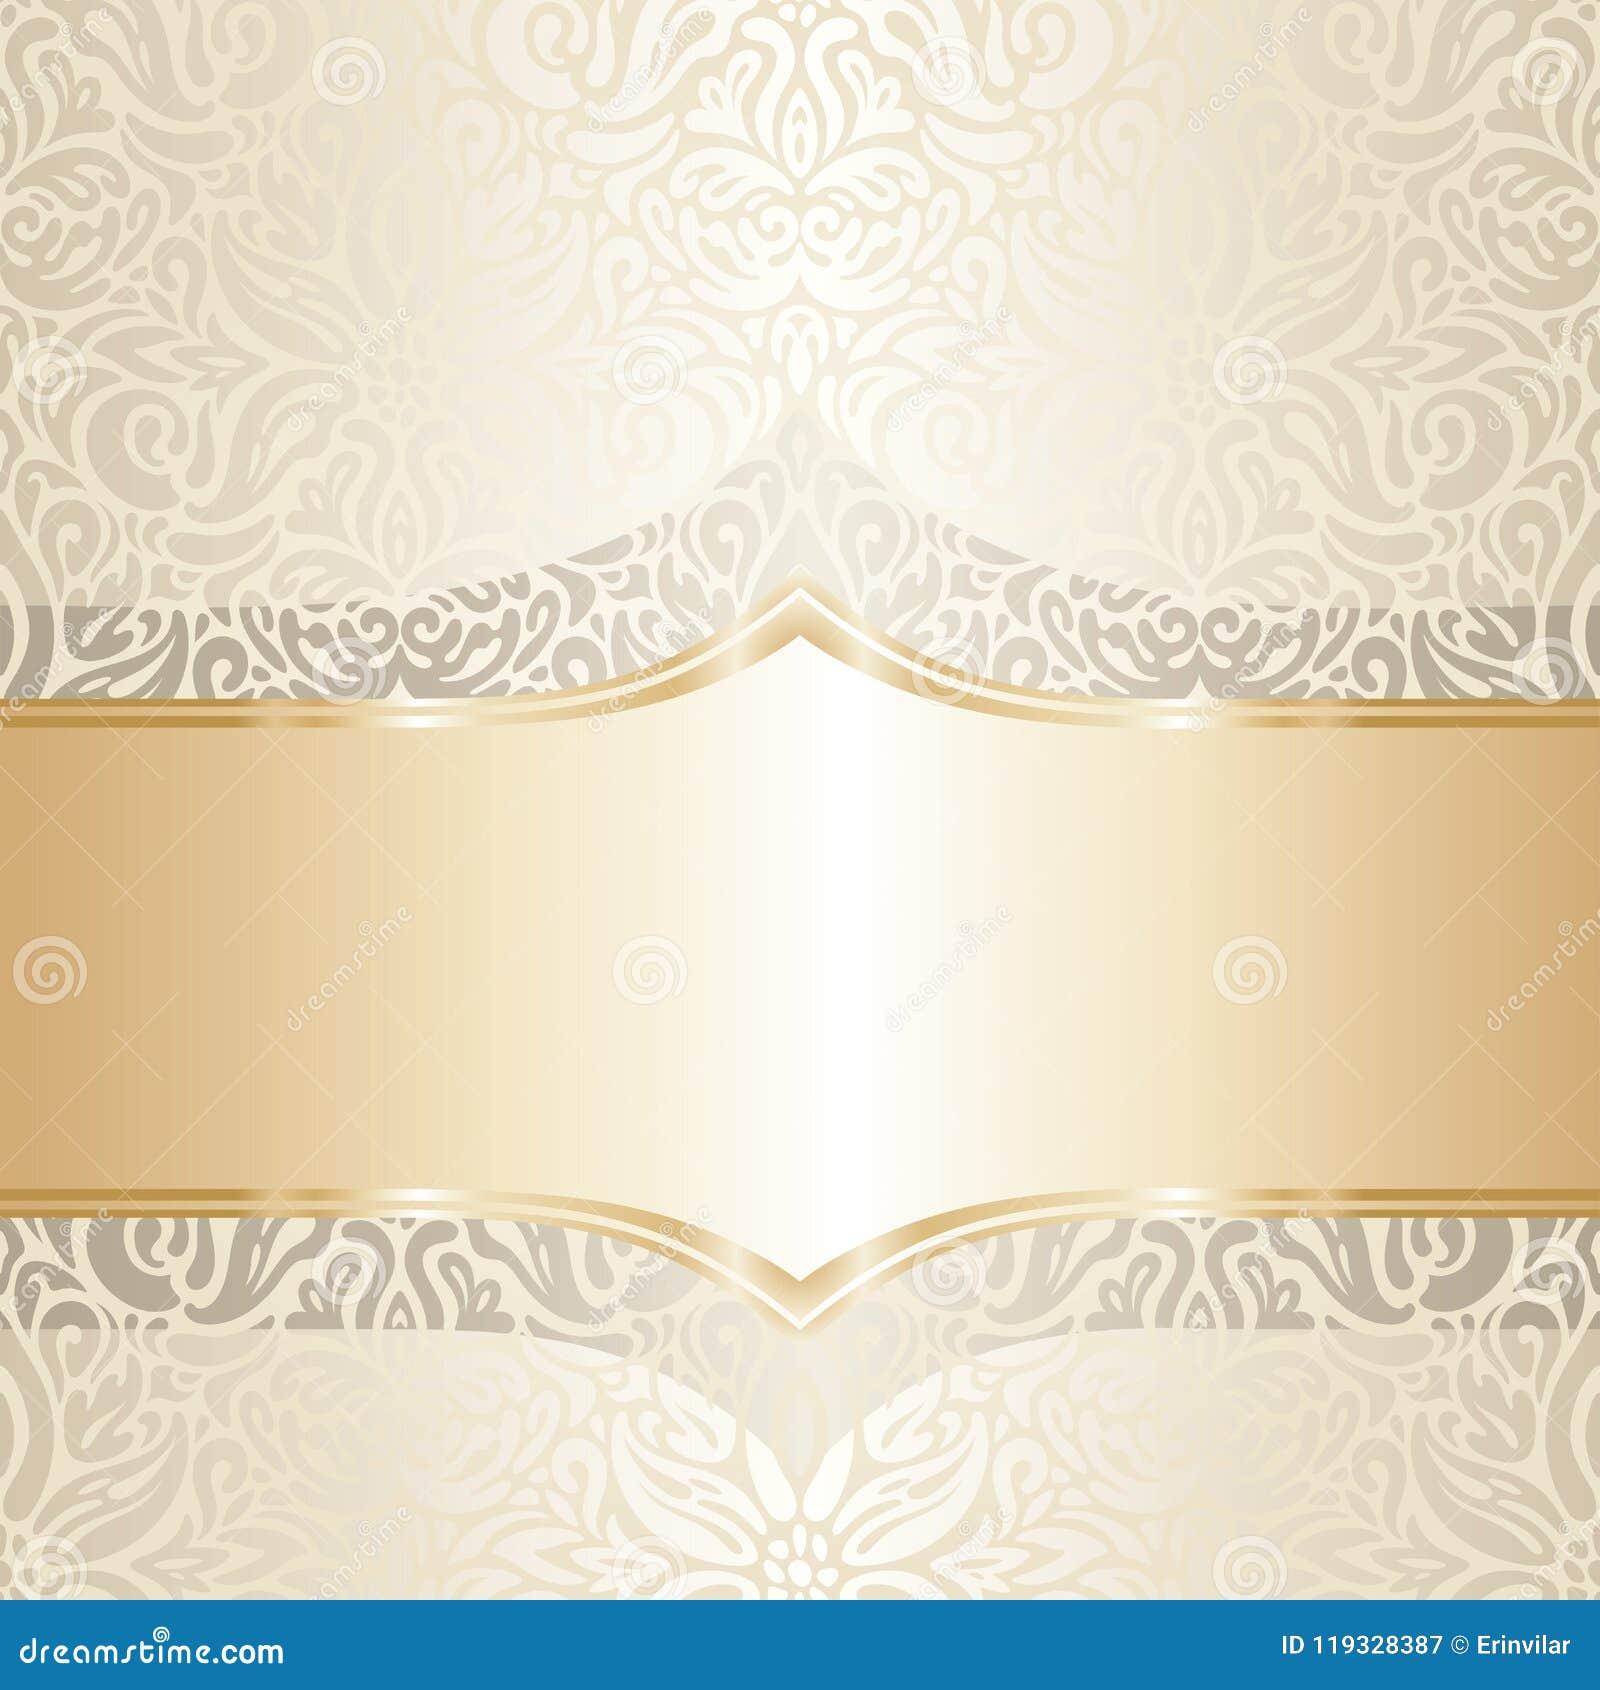 Floral Wedding Invitation Wallpaper Trend Design In Ecru & Gold ...